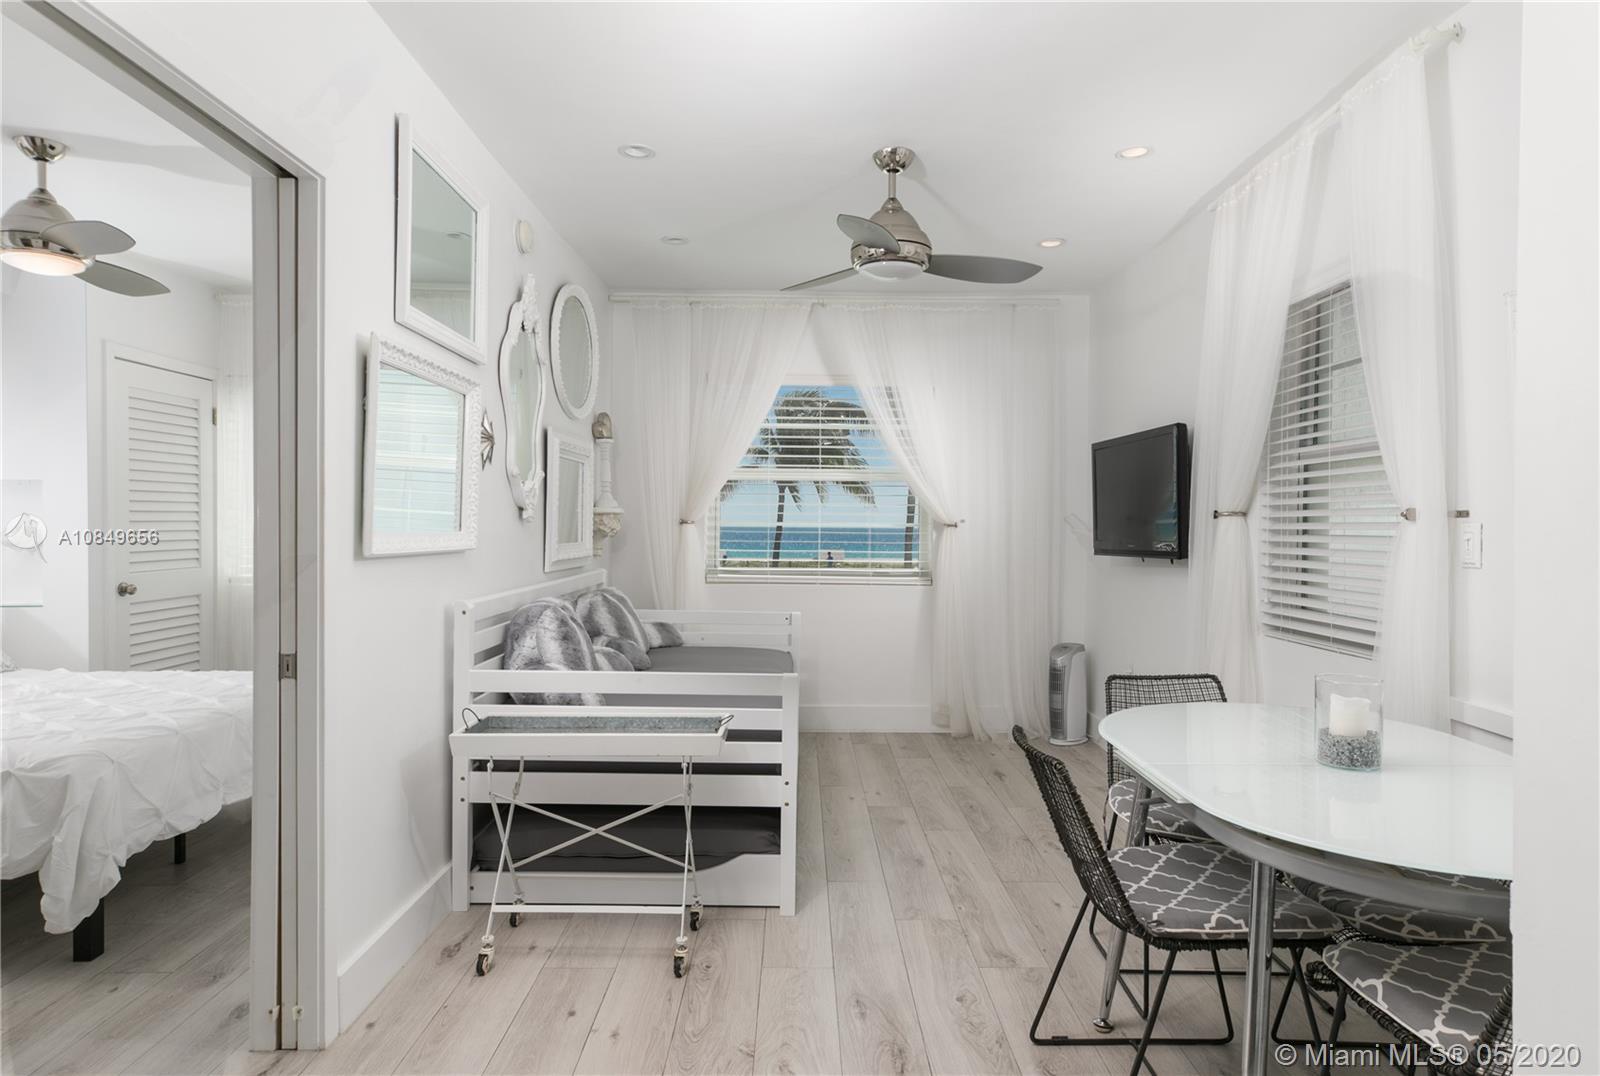 335 Ocean Dr # 239, Miami Beach, Florida 33139, 1 Bedroom Bedrooms, ,1 BathroomBathrooms,Residential,For Sale,335 Ocean Dr # 239,A10849656